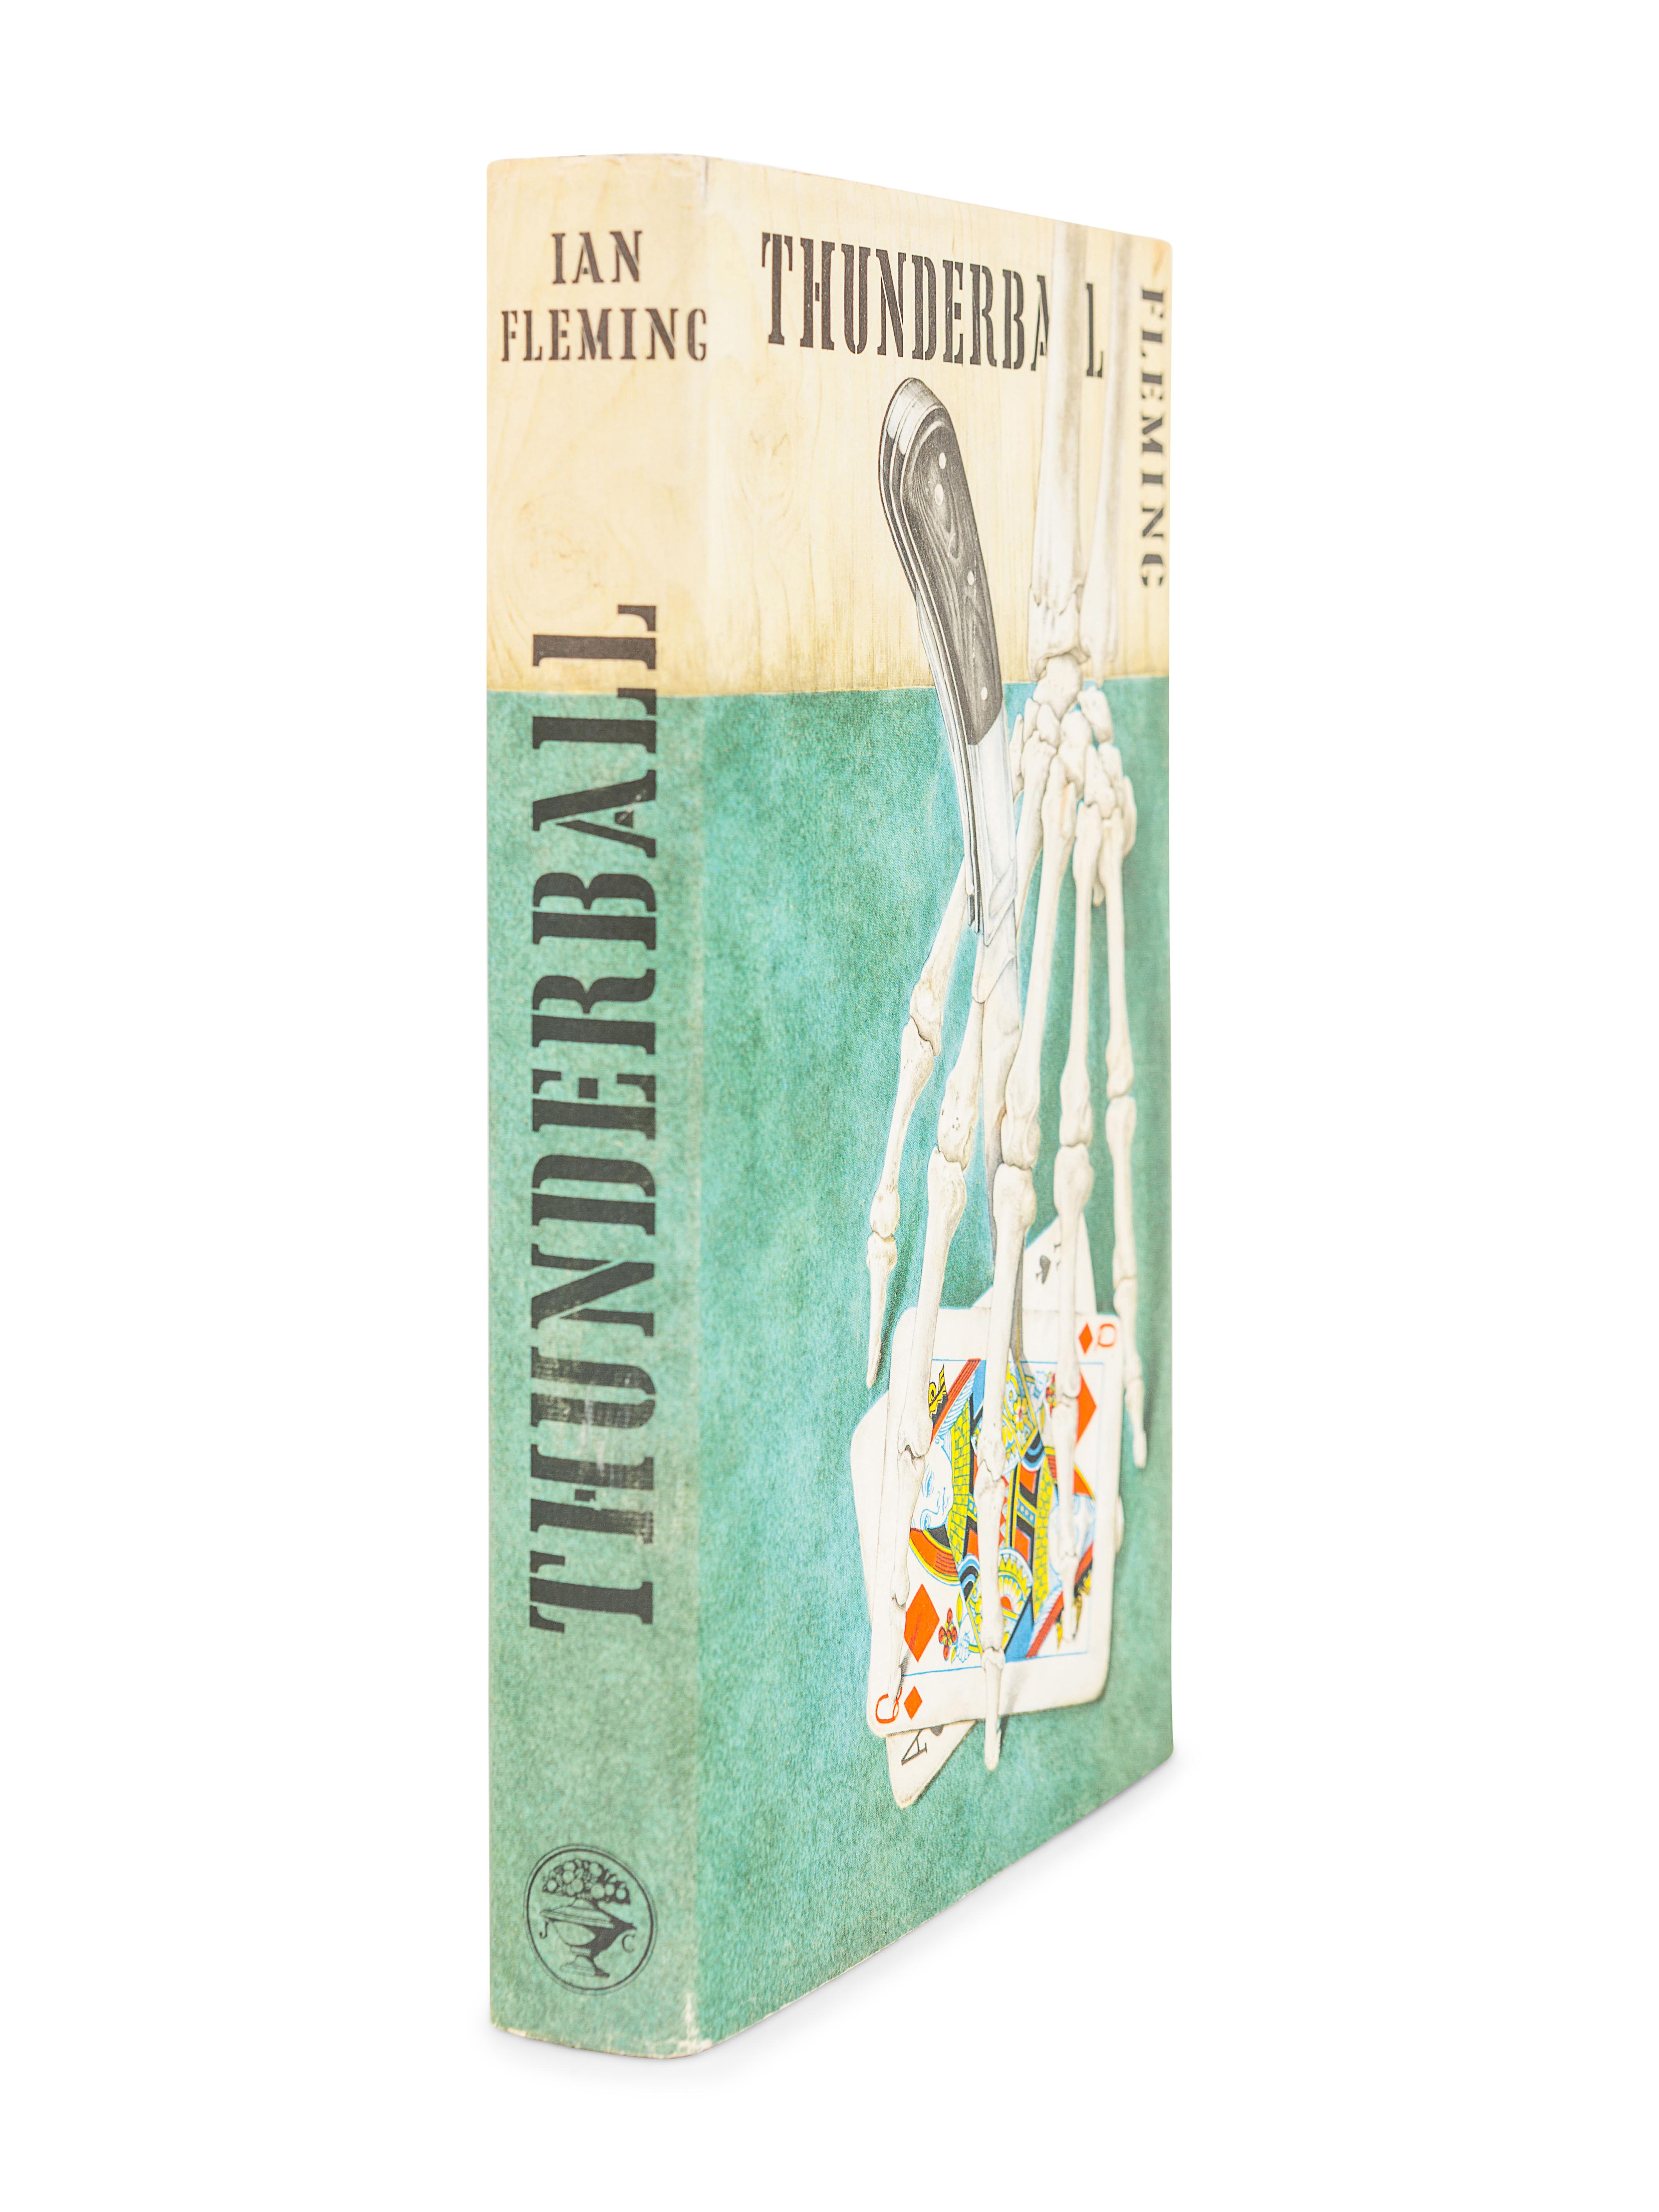 FLEMING, Ian (1908-1964). Thunderball. London: Jonathan Cape, 1961. - Image 3 of 3